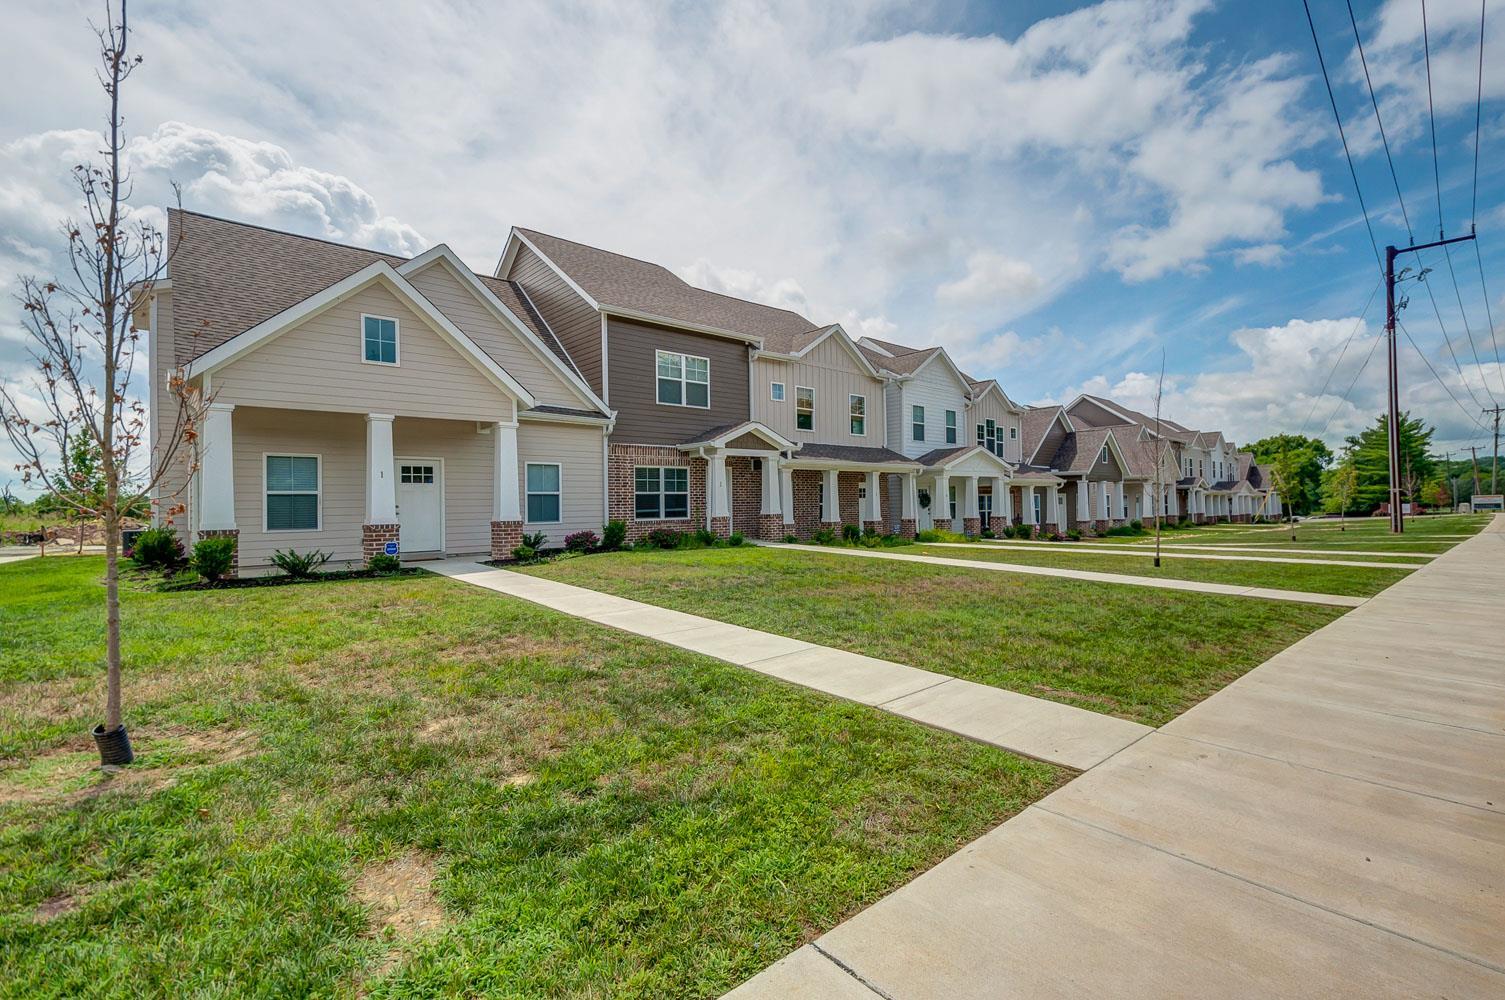 834 Ashland Place Dr, Nashville, TN 37218 - Nashville, TN real estate listing